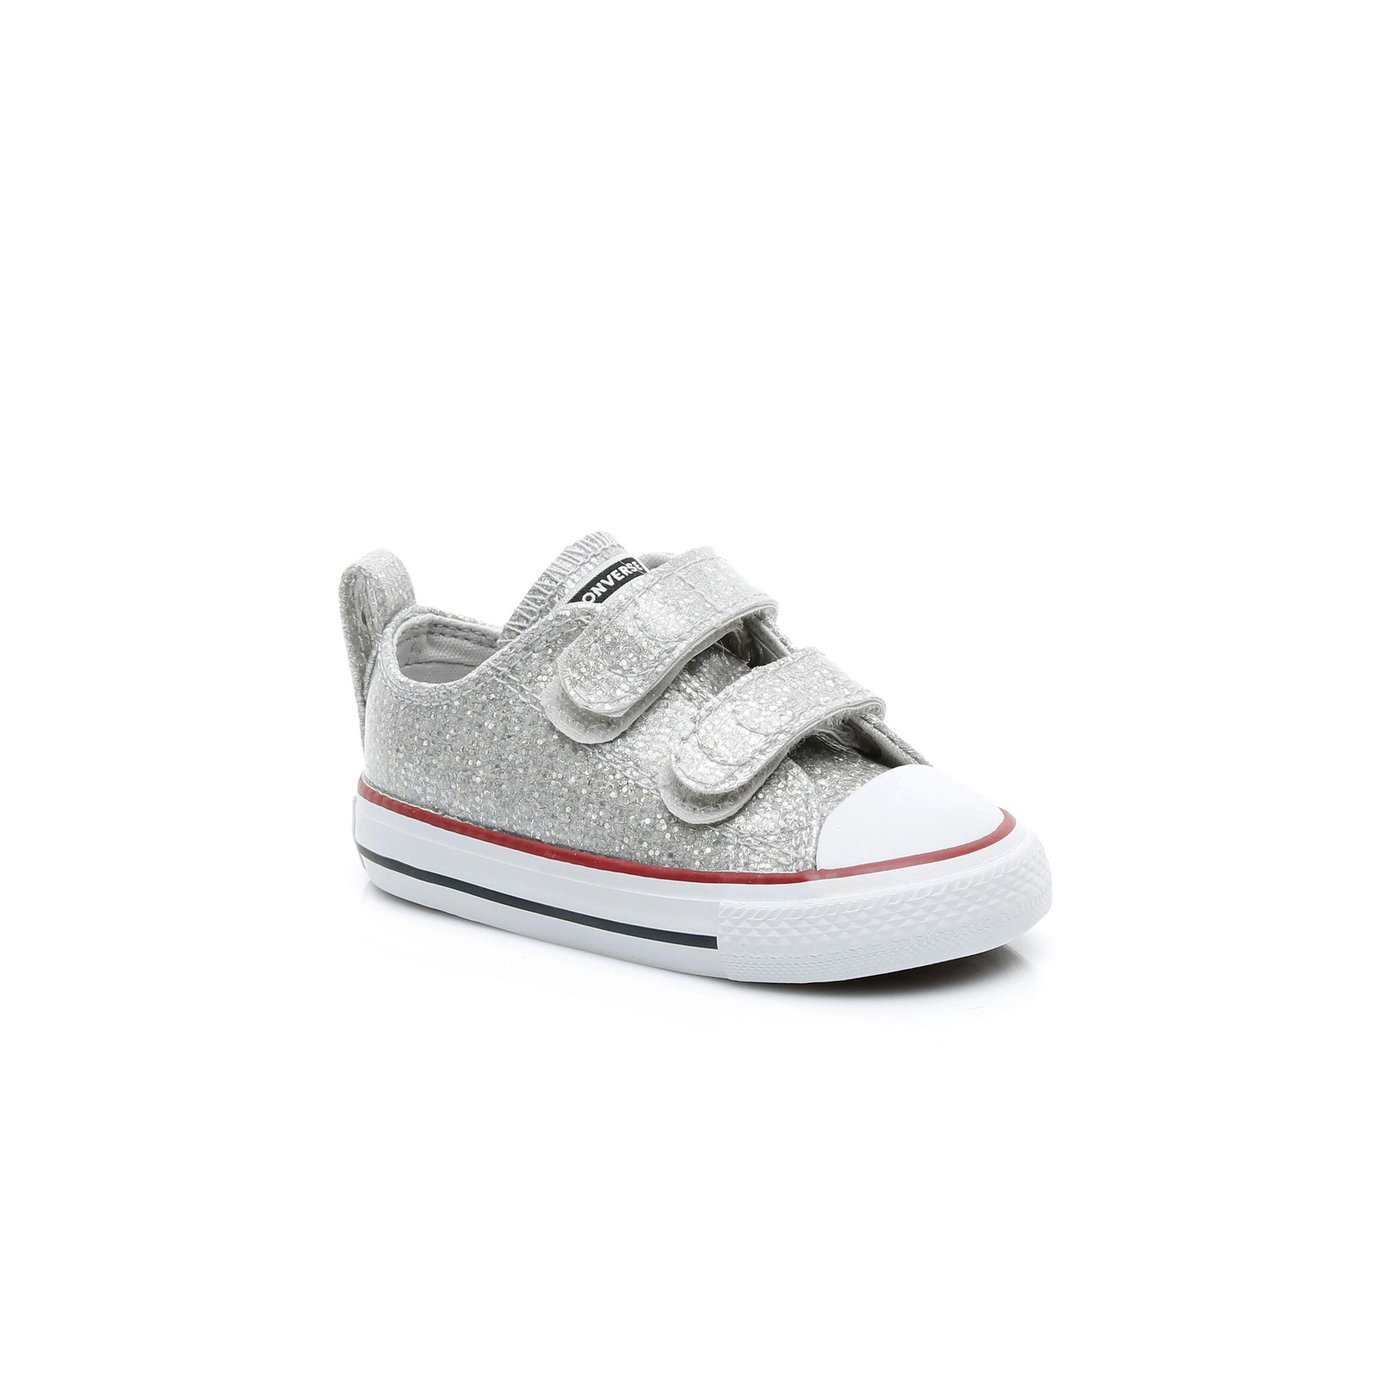 Converse Chuck Taylor All Star 2V Sparkle Çocuk Gri Sneaker